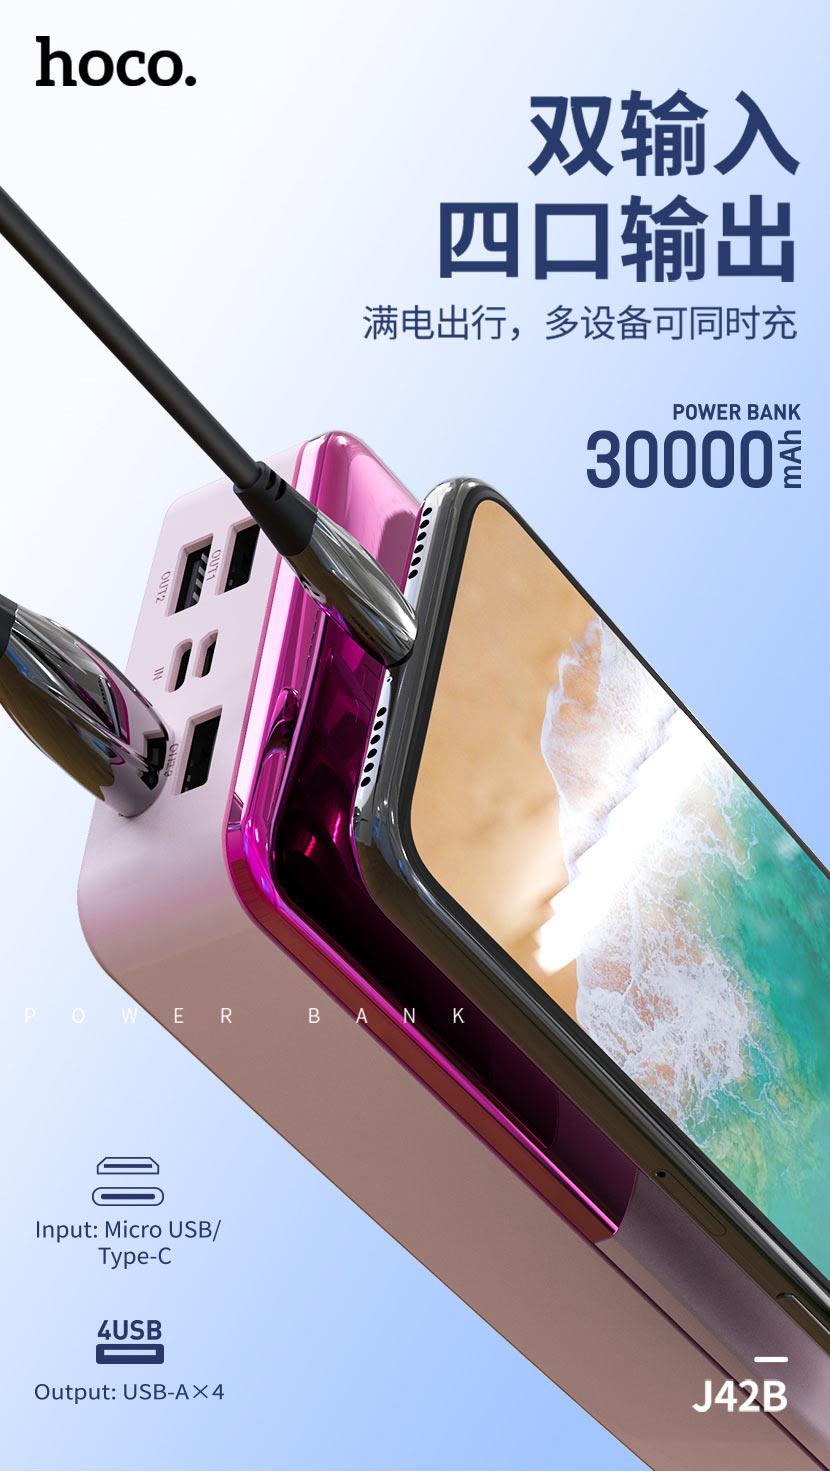 hoco news j42b high power mobile power bank 30000mah ports cn